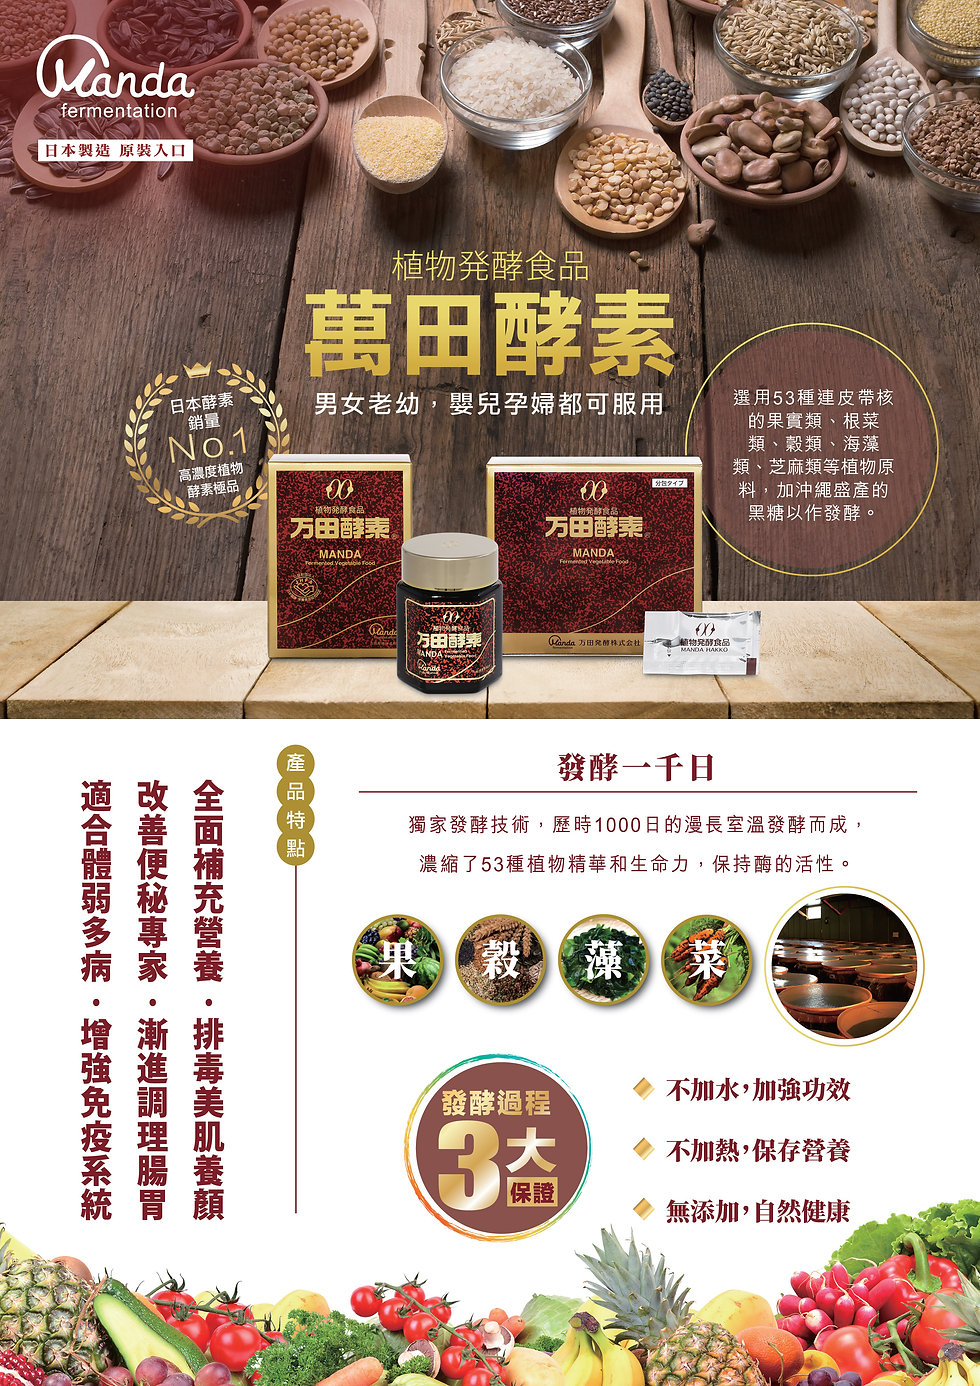 A4-leaflet-萬田-RGB-01.jpg